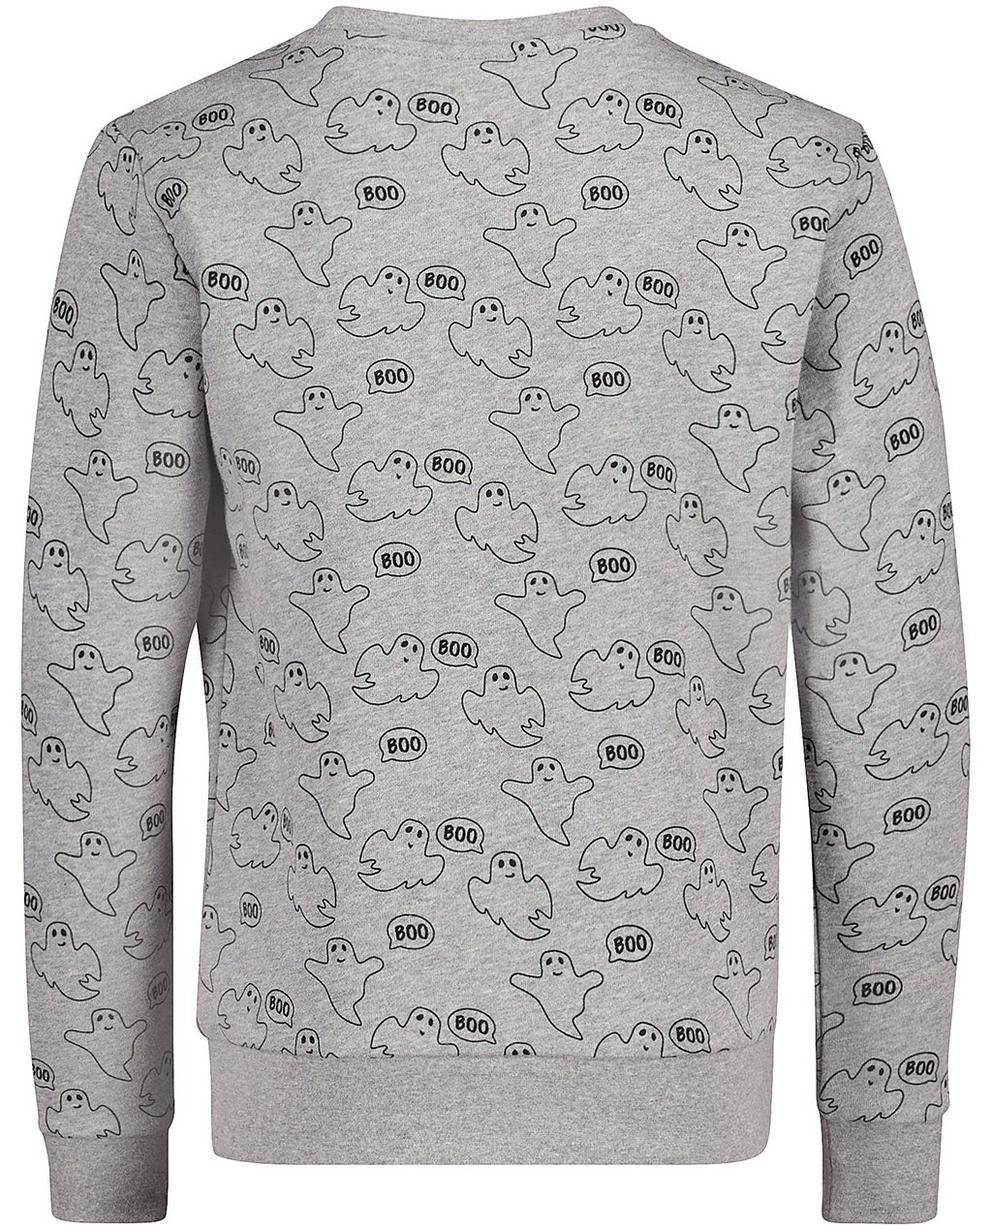 Sweater - Grau -